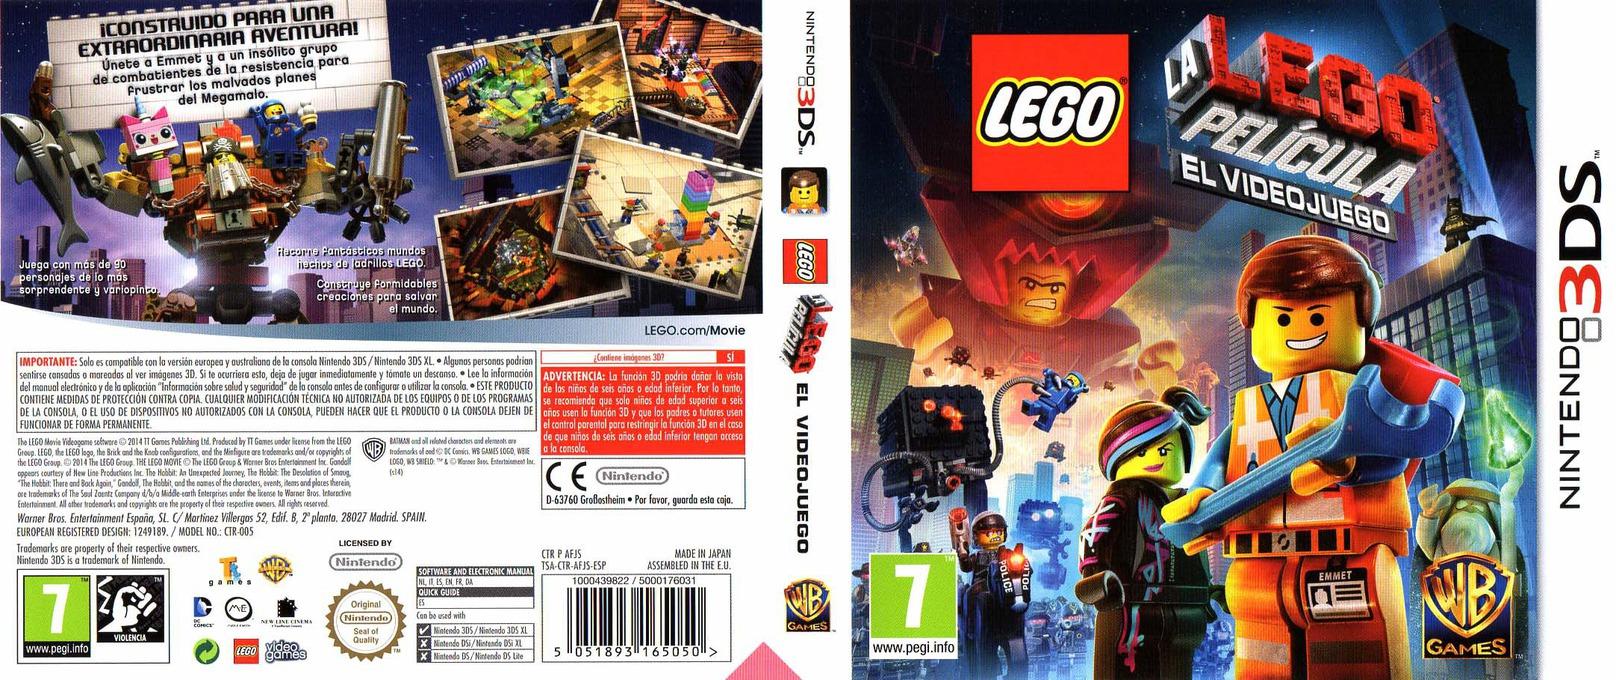 afjs the lego movie videogame